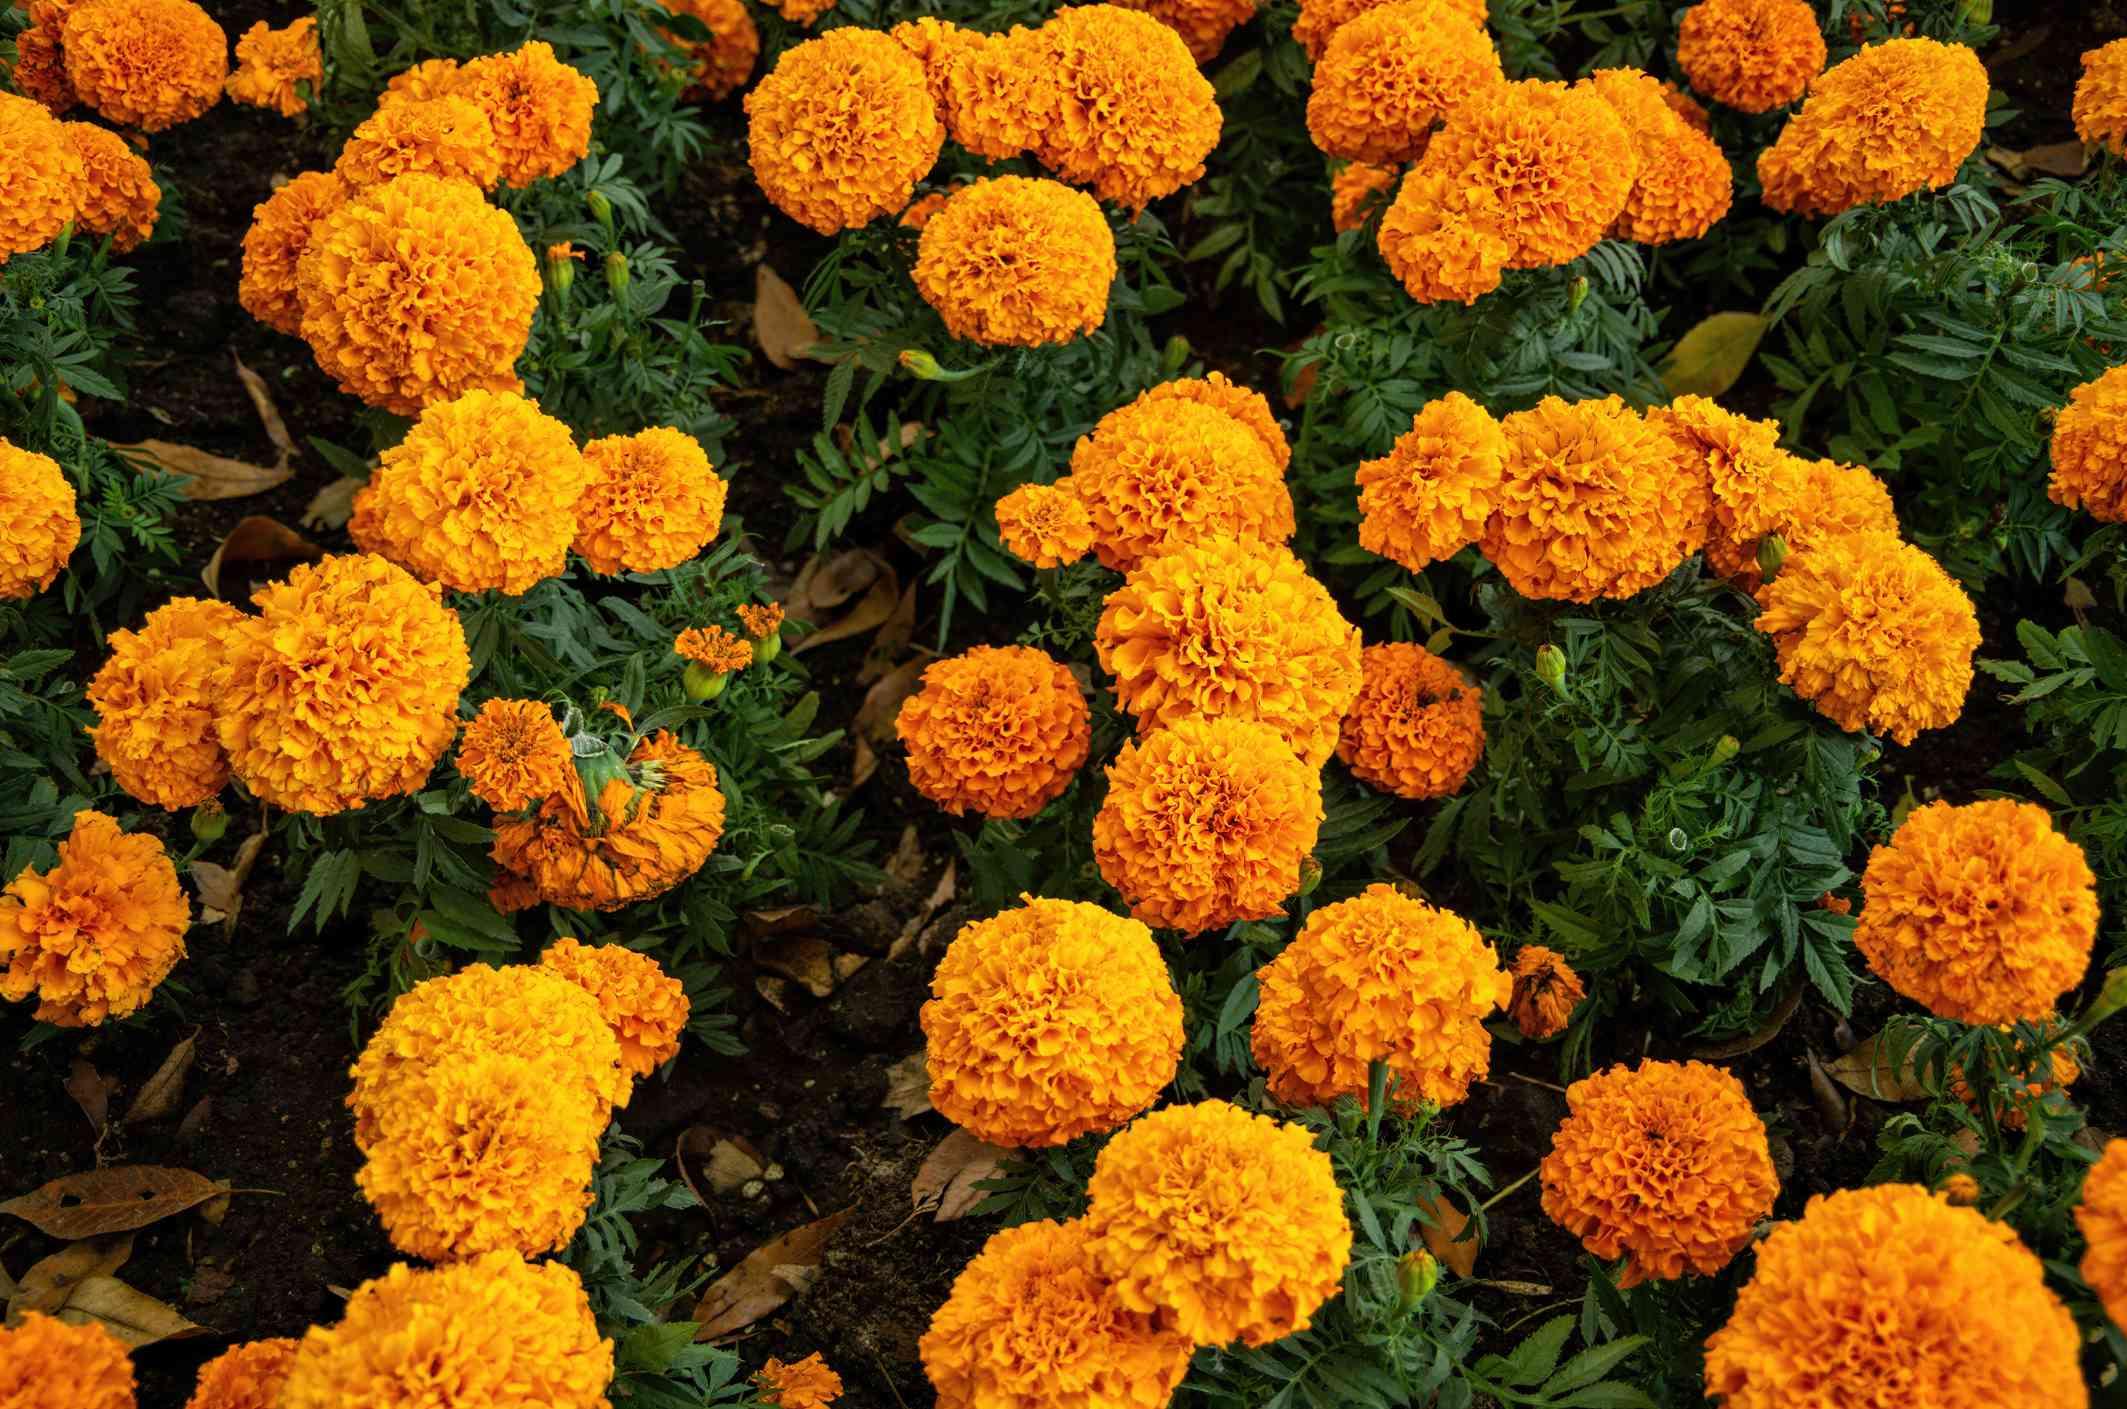 Flowerbed of marigolds